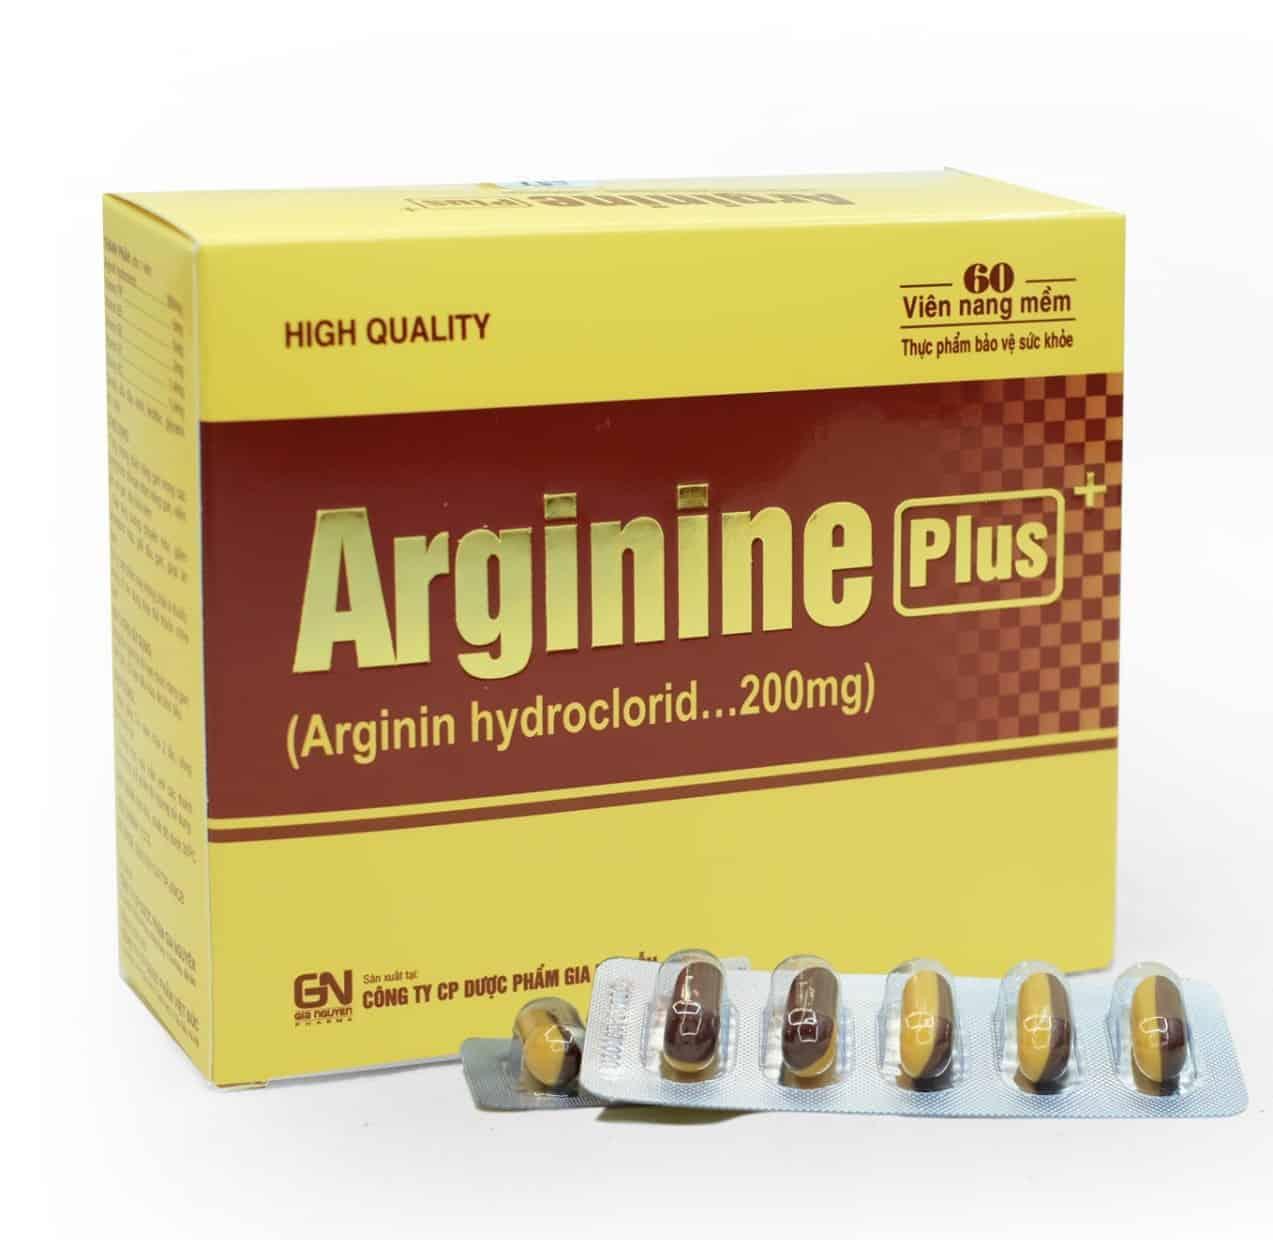 thuốc bổ gan arginin